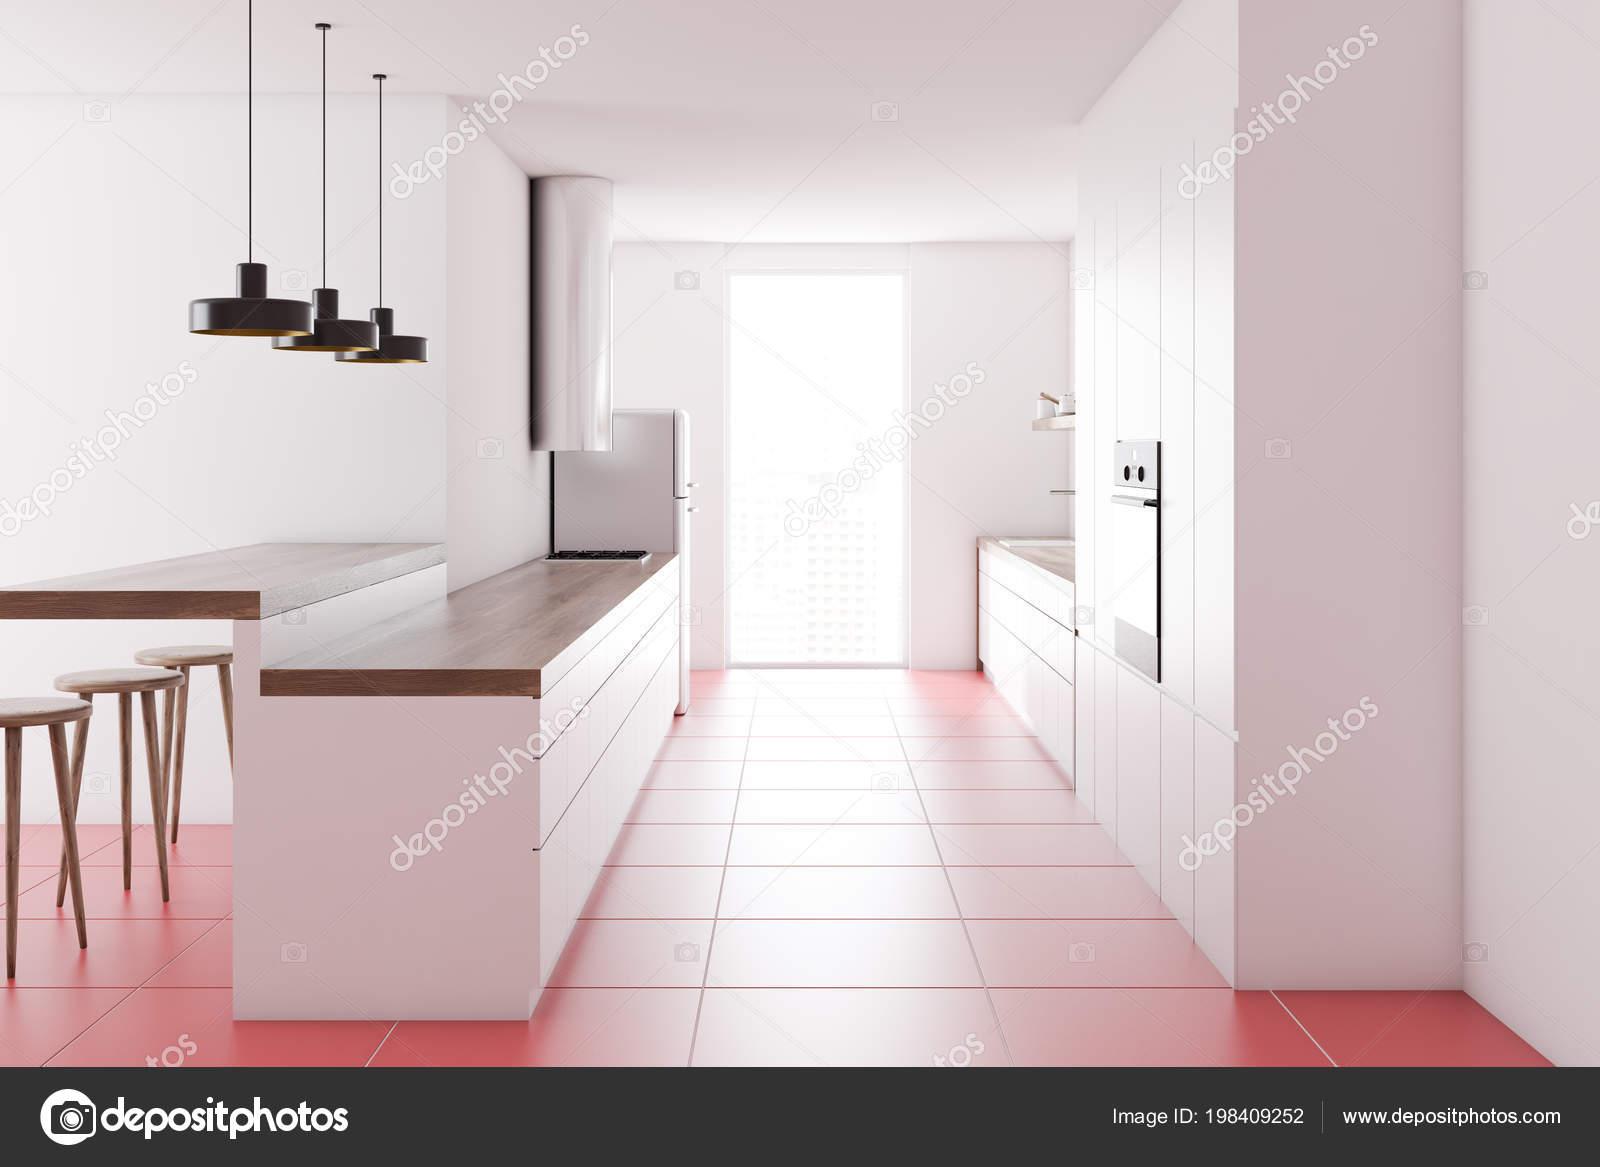 Piani cucina bianco piedi interno cucina parete bianca con